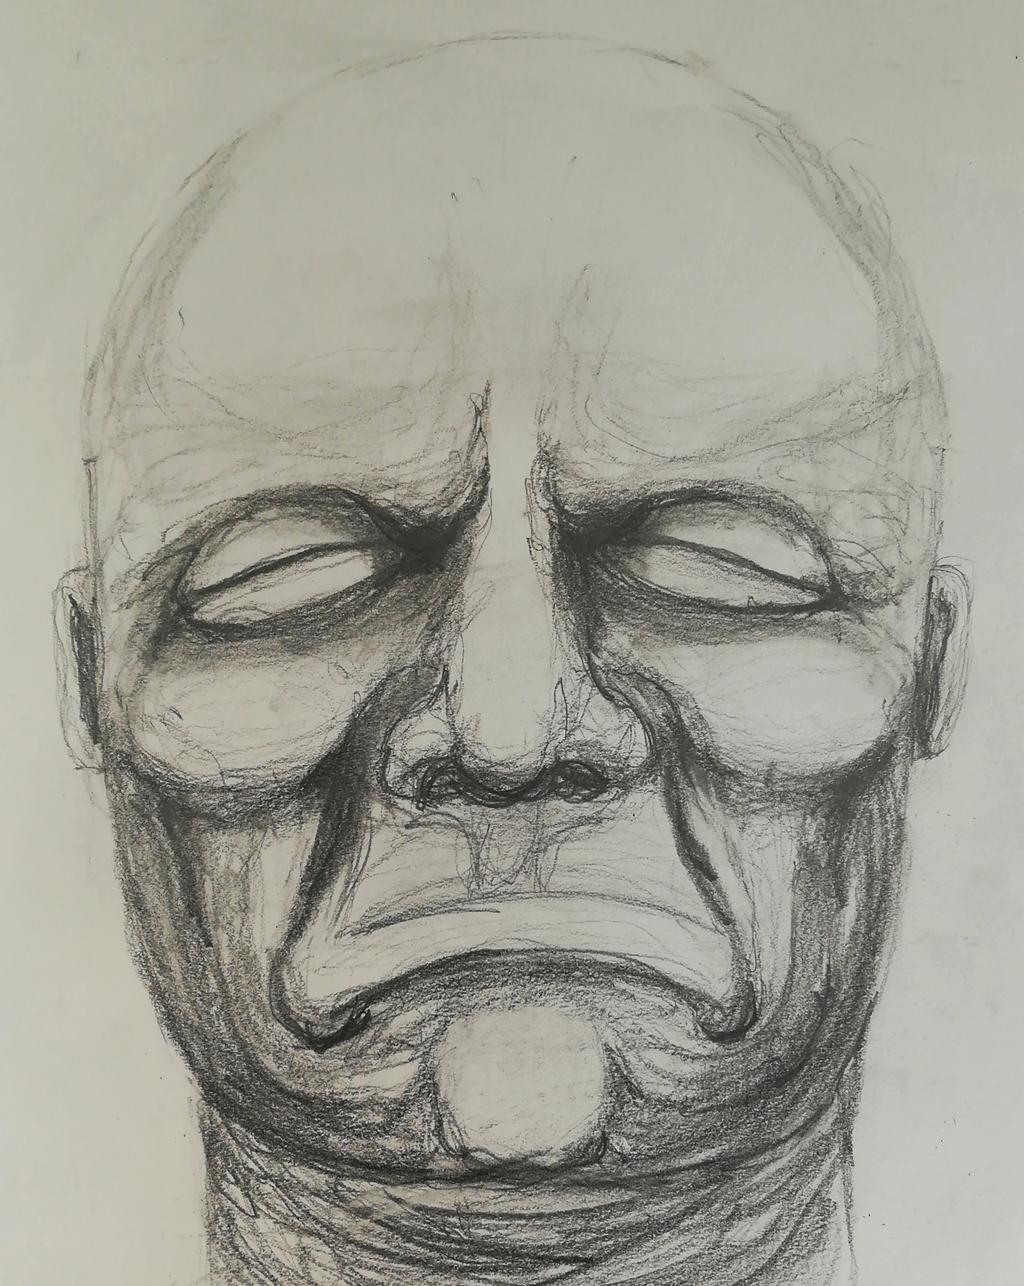 Study of a bust by Allexbiggb